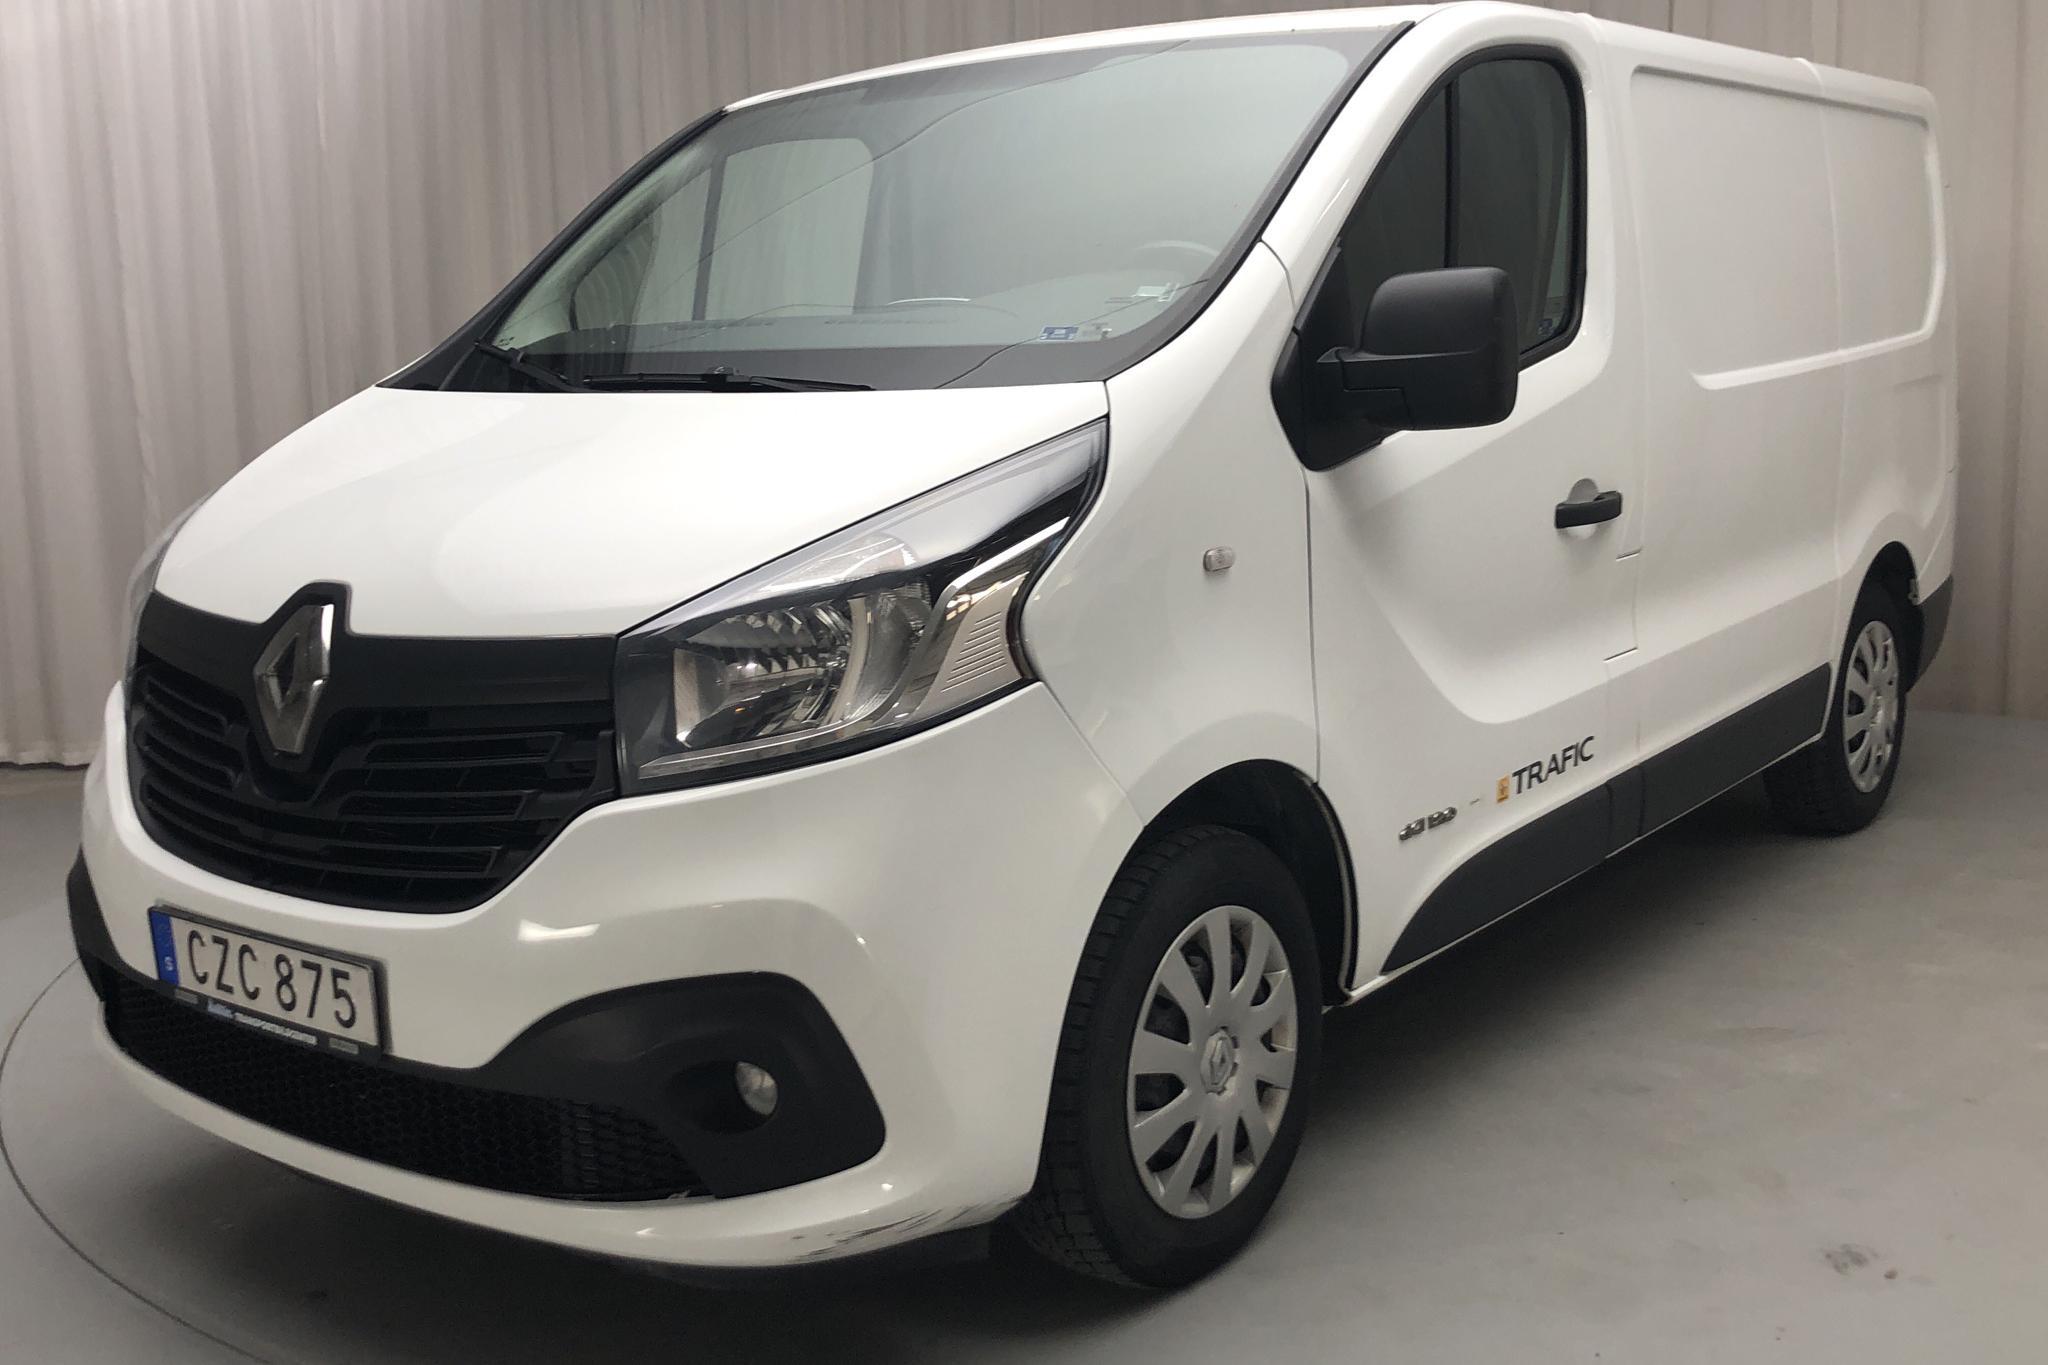 Renault Trafic 1.6 dCi Skåp (120hk) - 250 930 km - Manual - white - 2015